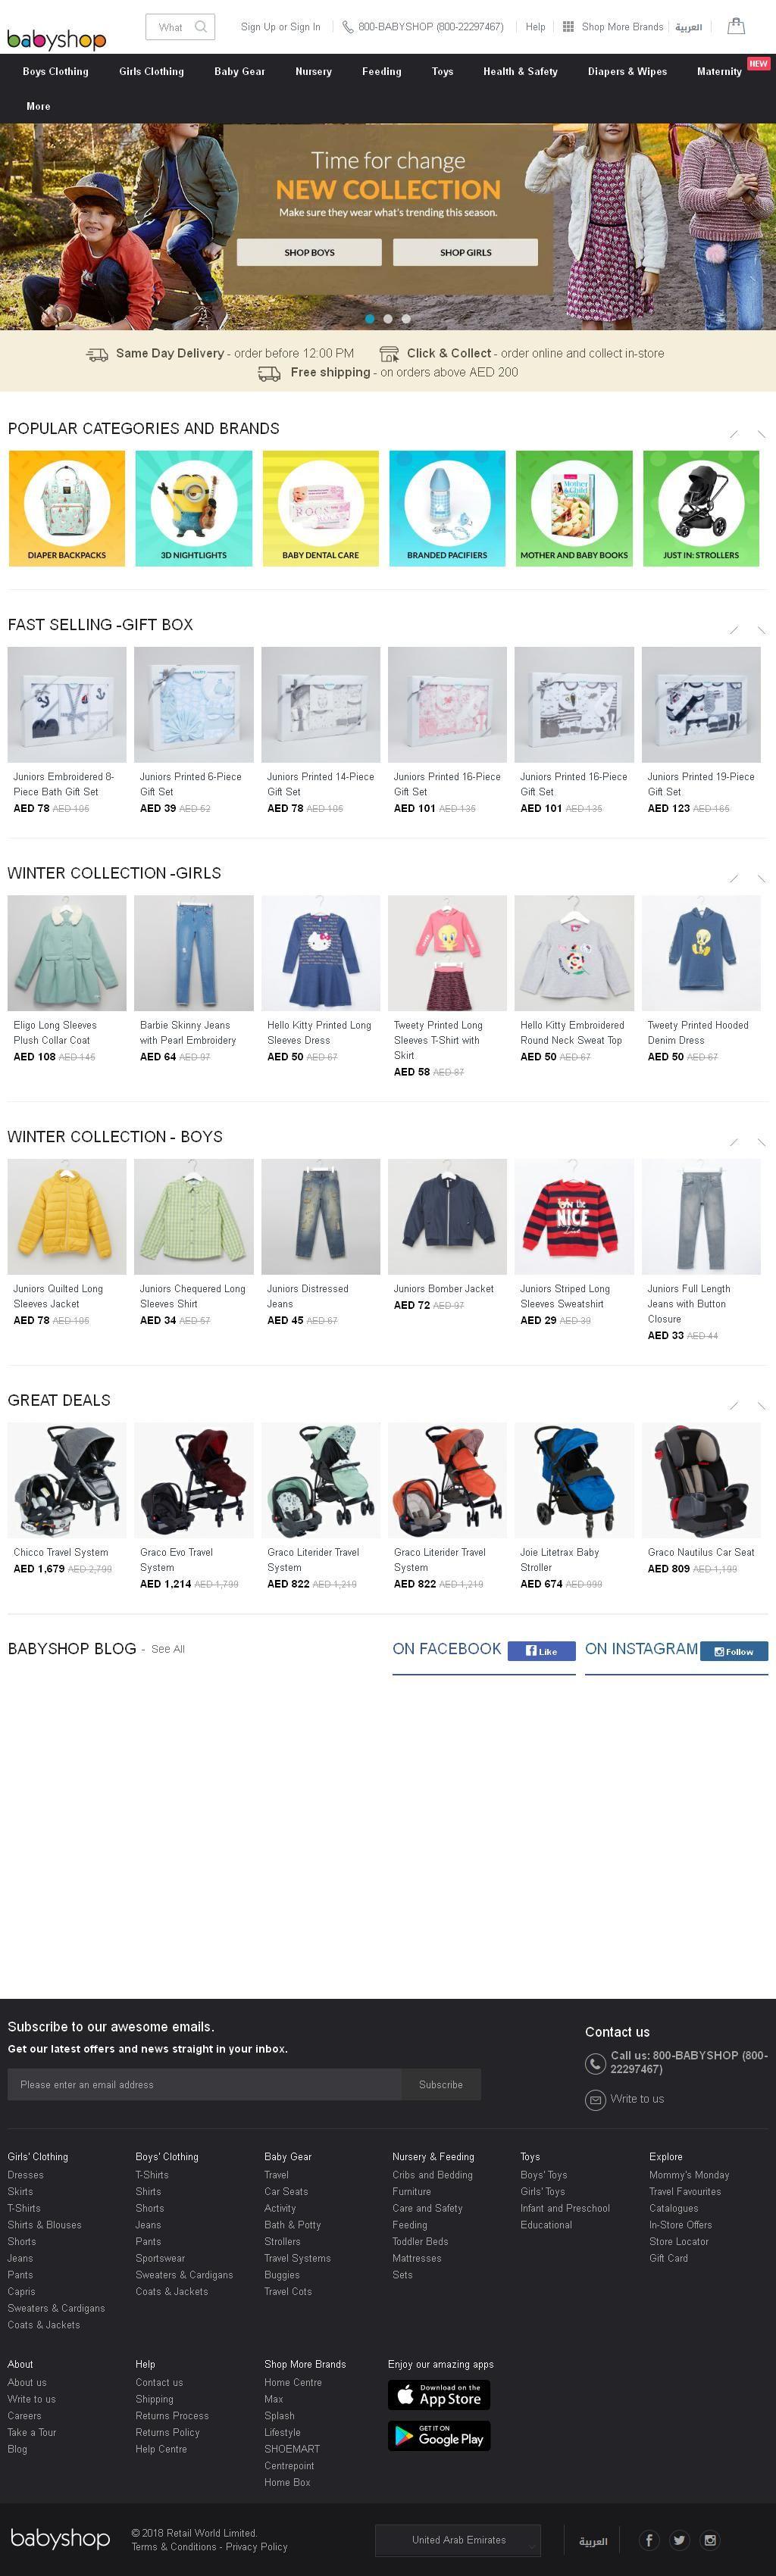 Babyshop Kids Clothing Shop 129, Sheikh Saqr Bin Khalid Al